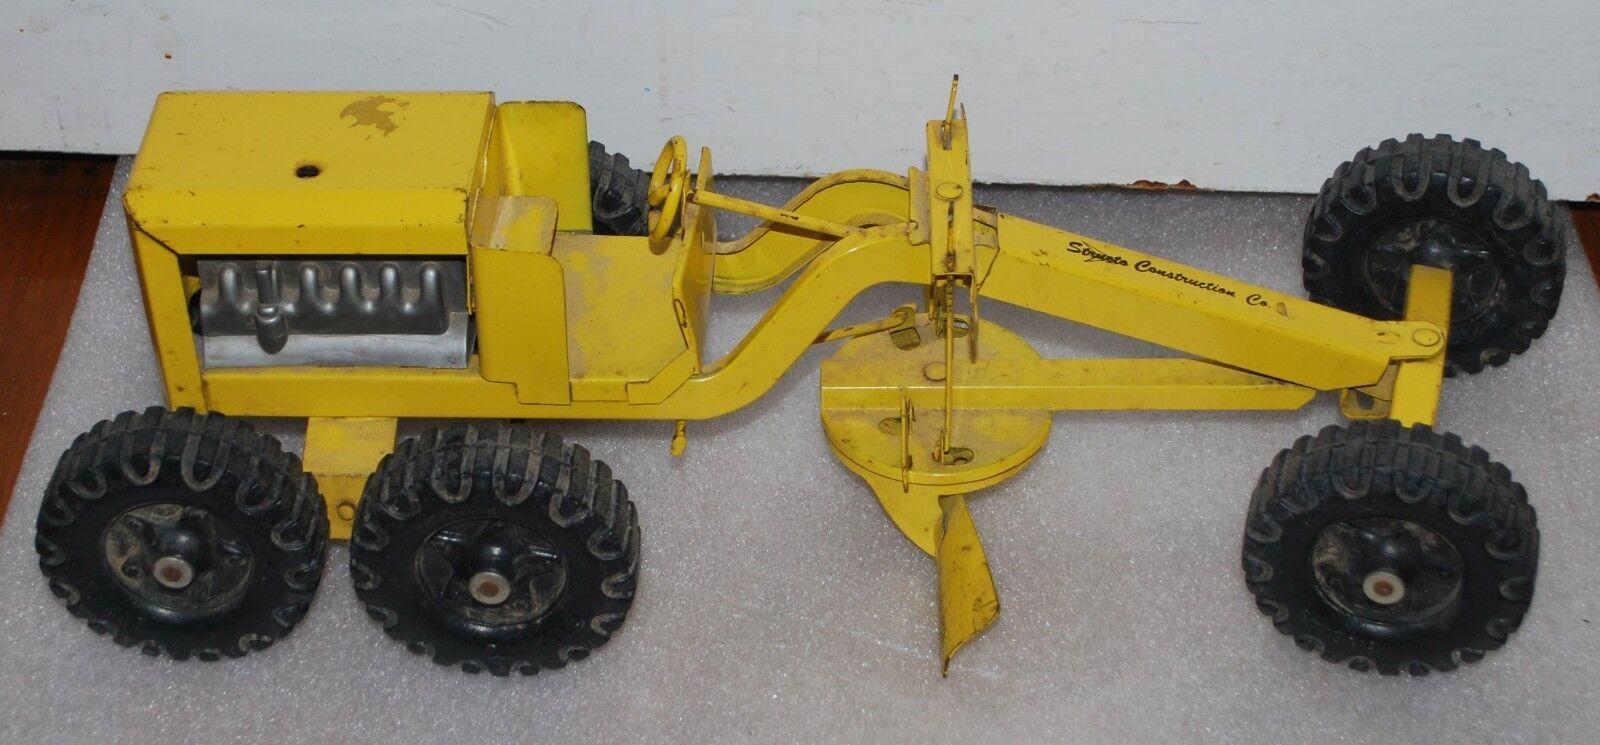 Jahrgang structo baufirma straße grader gelbe metall spielzeug - auto.